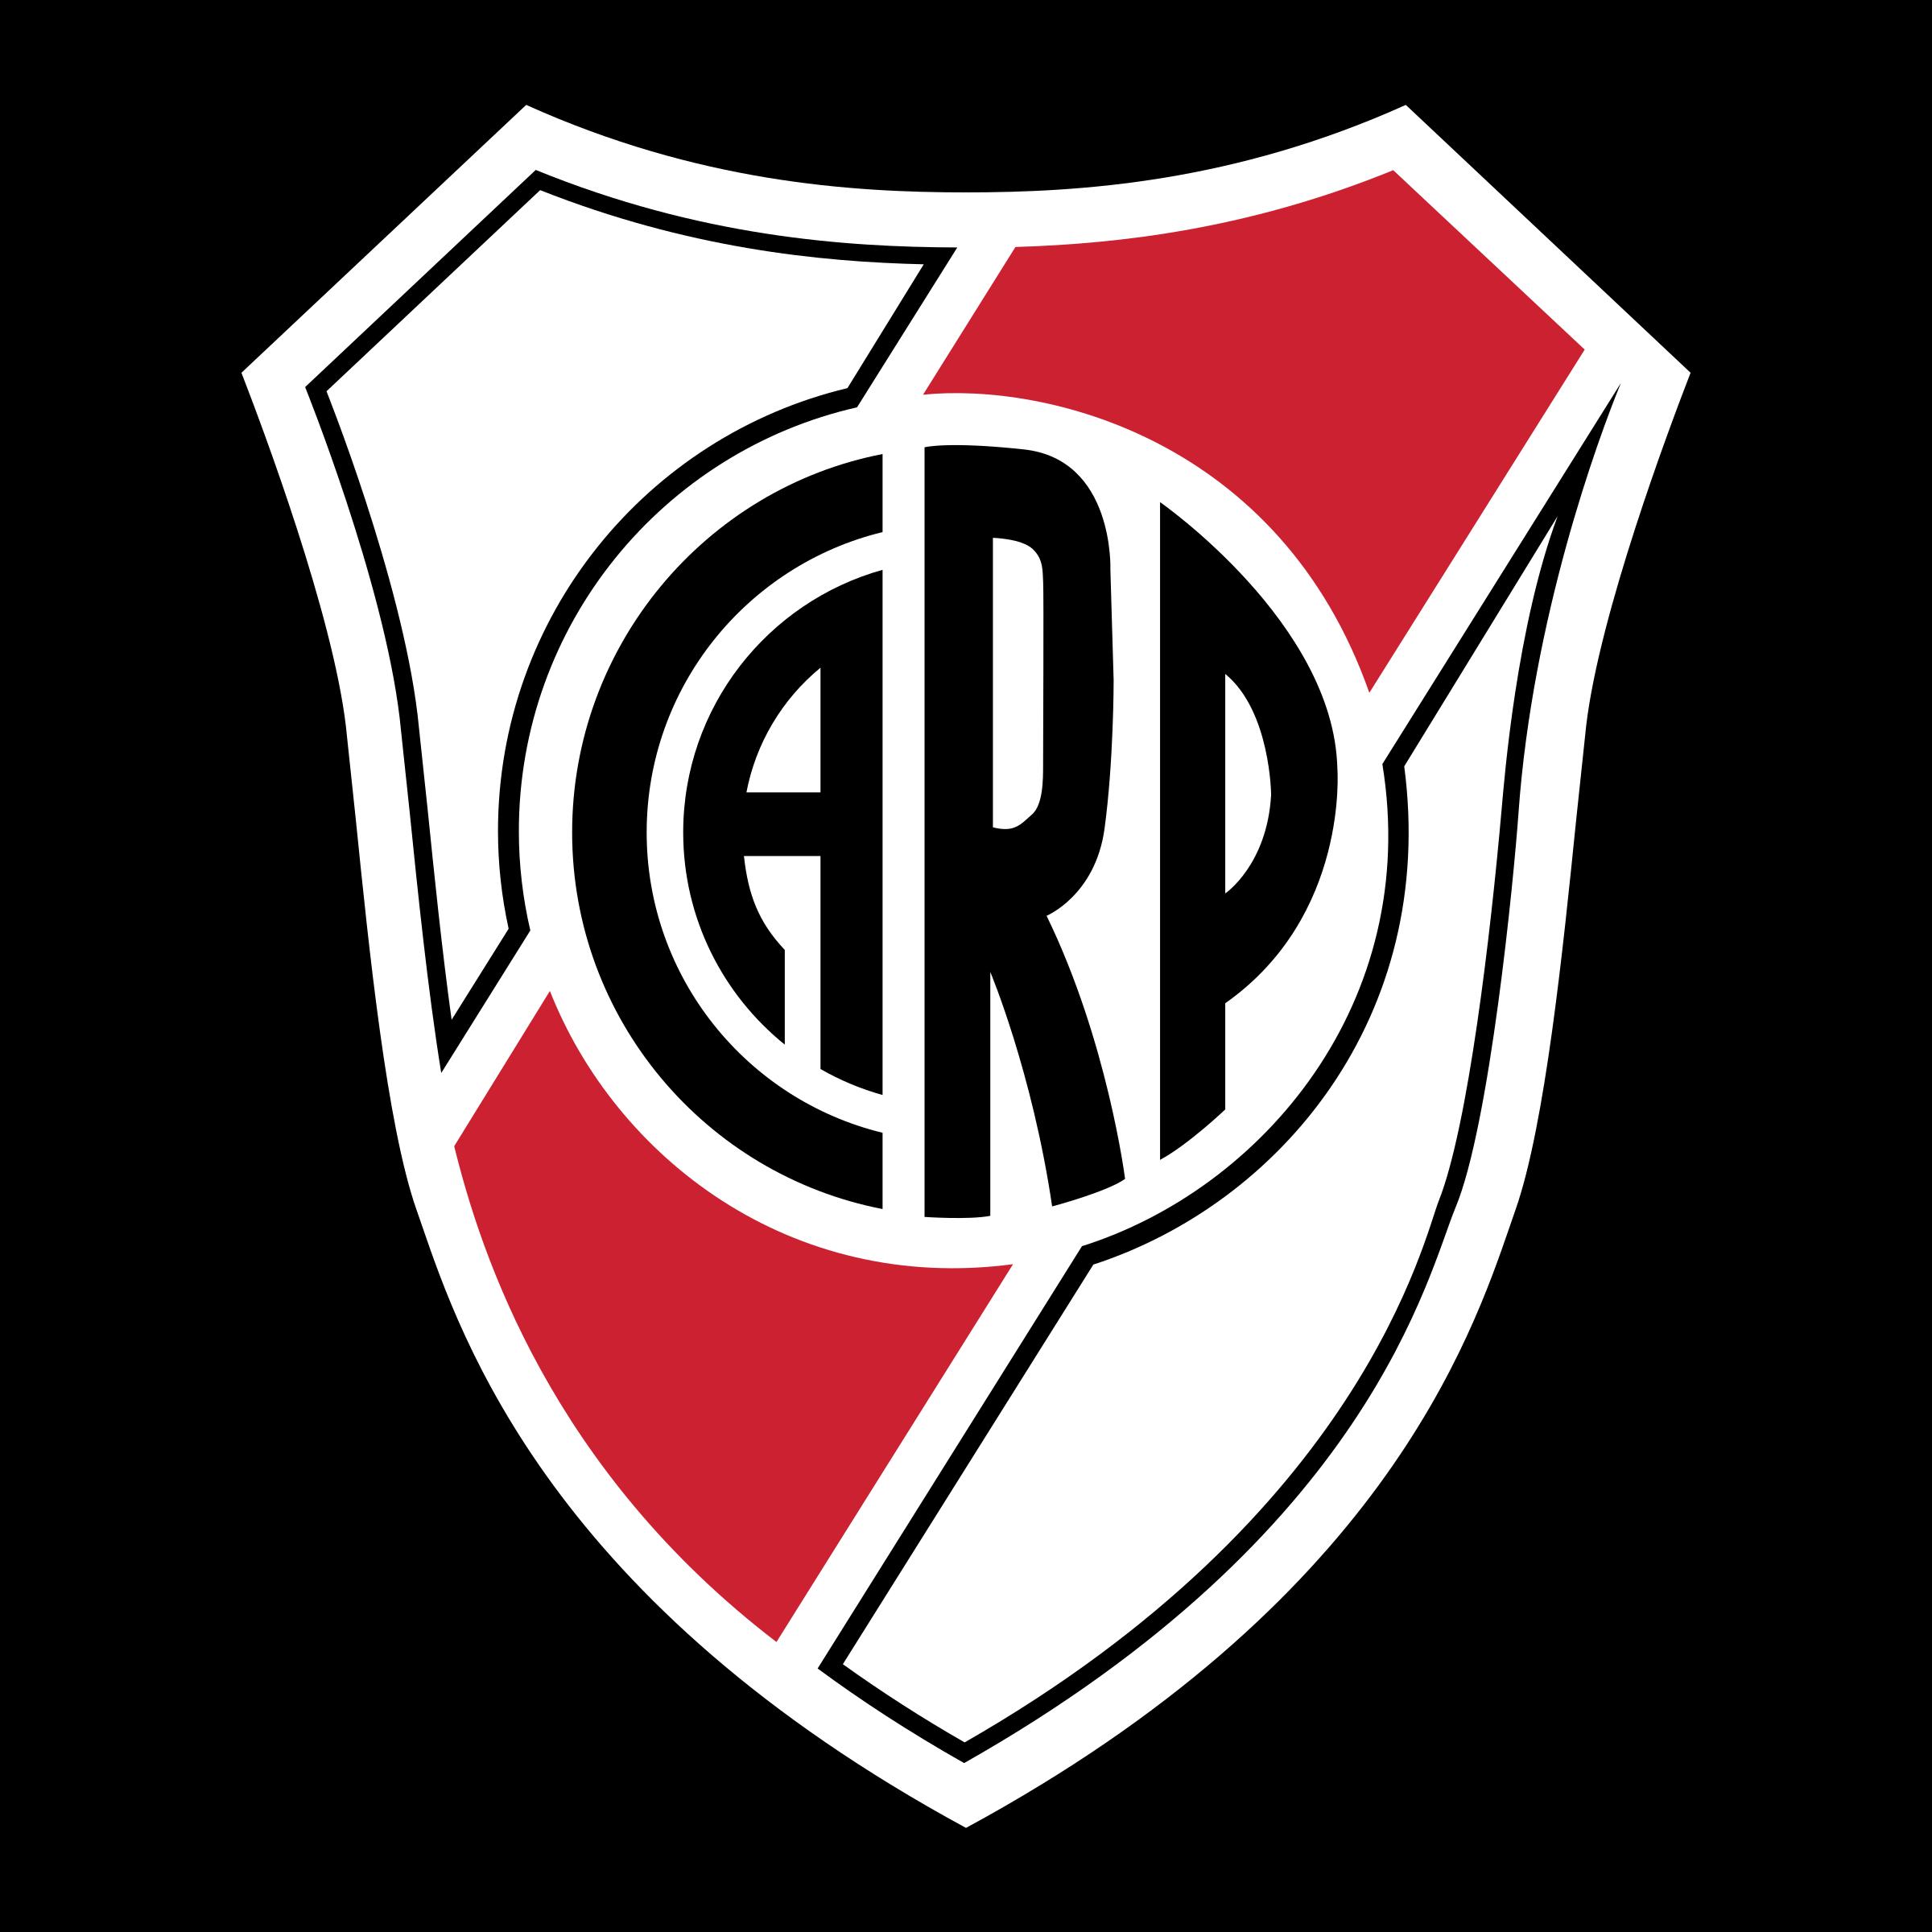 Club Atletico River Plate Logo PNG Transparent & SVG Vector